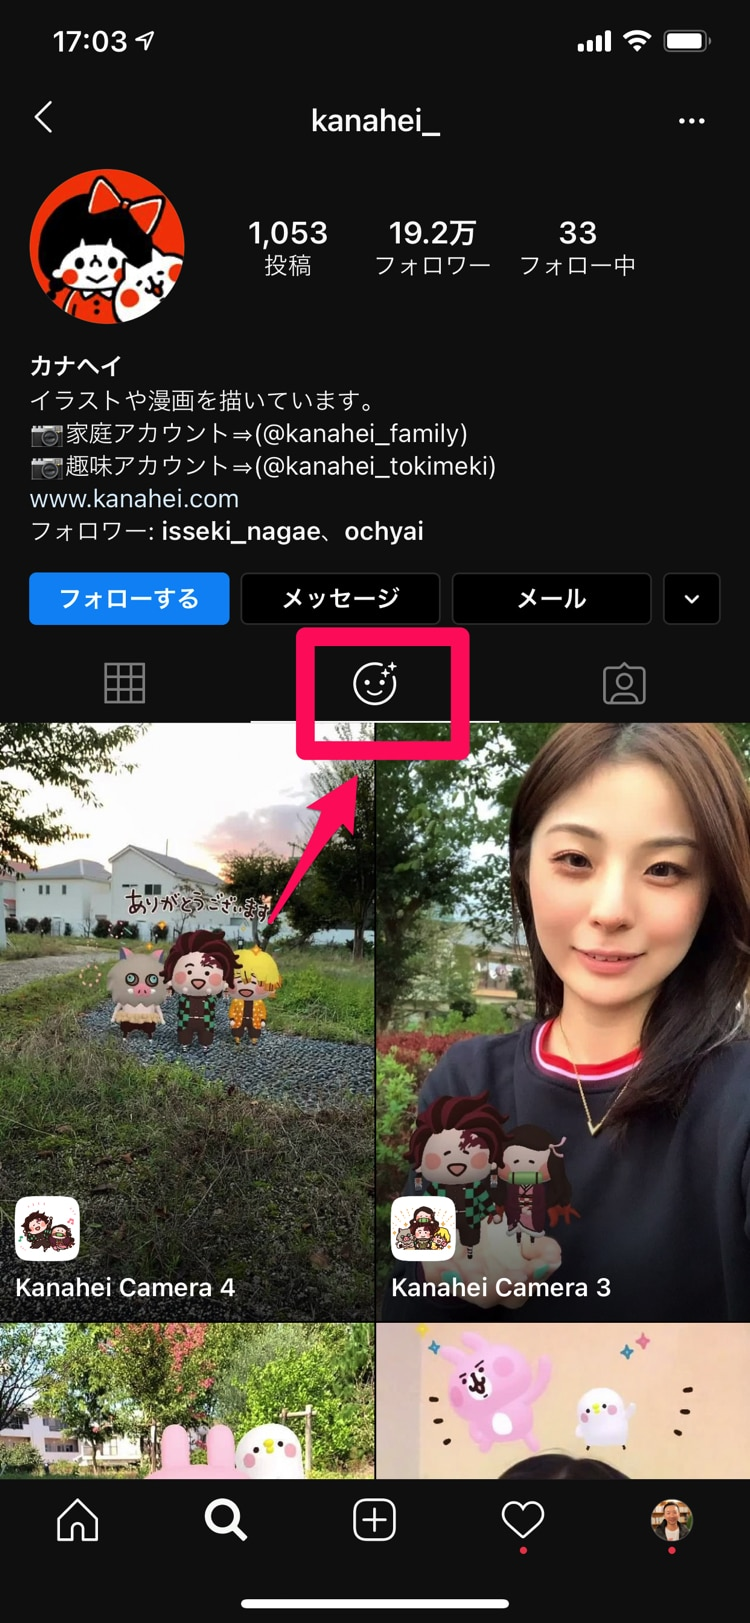 InstagramのARカメラエフェクトタブを開く